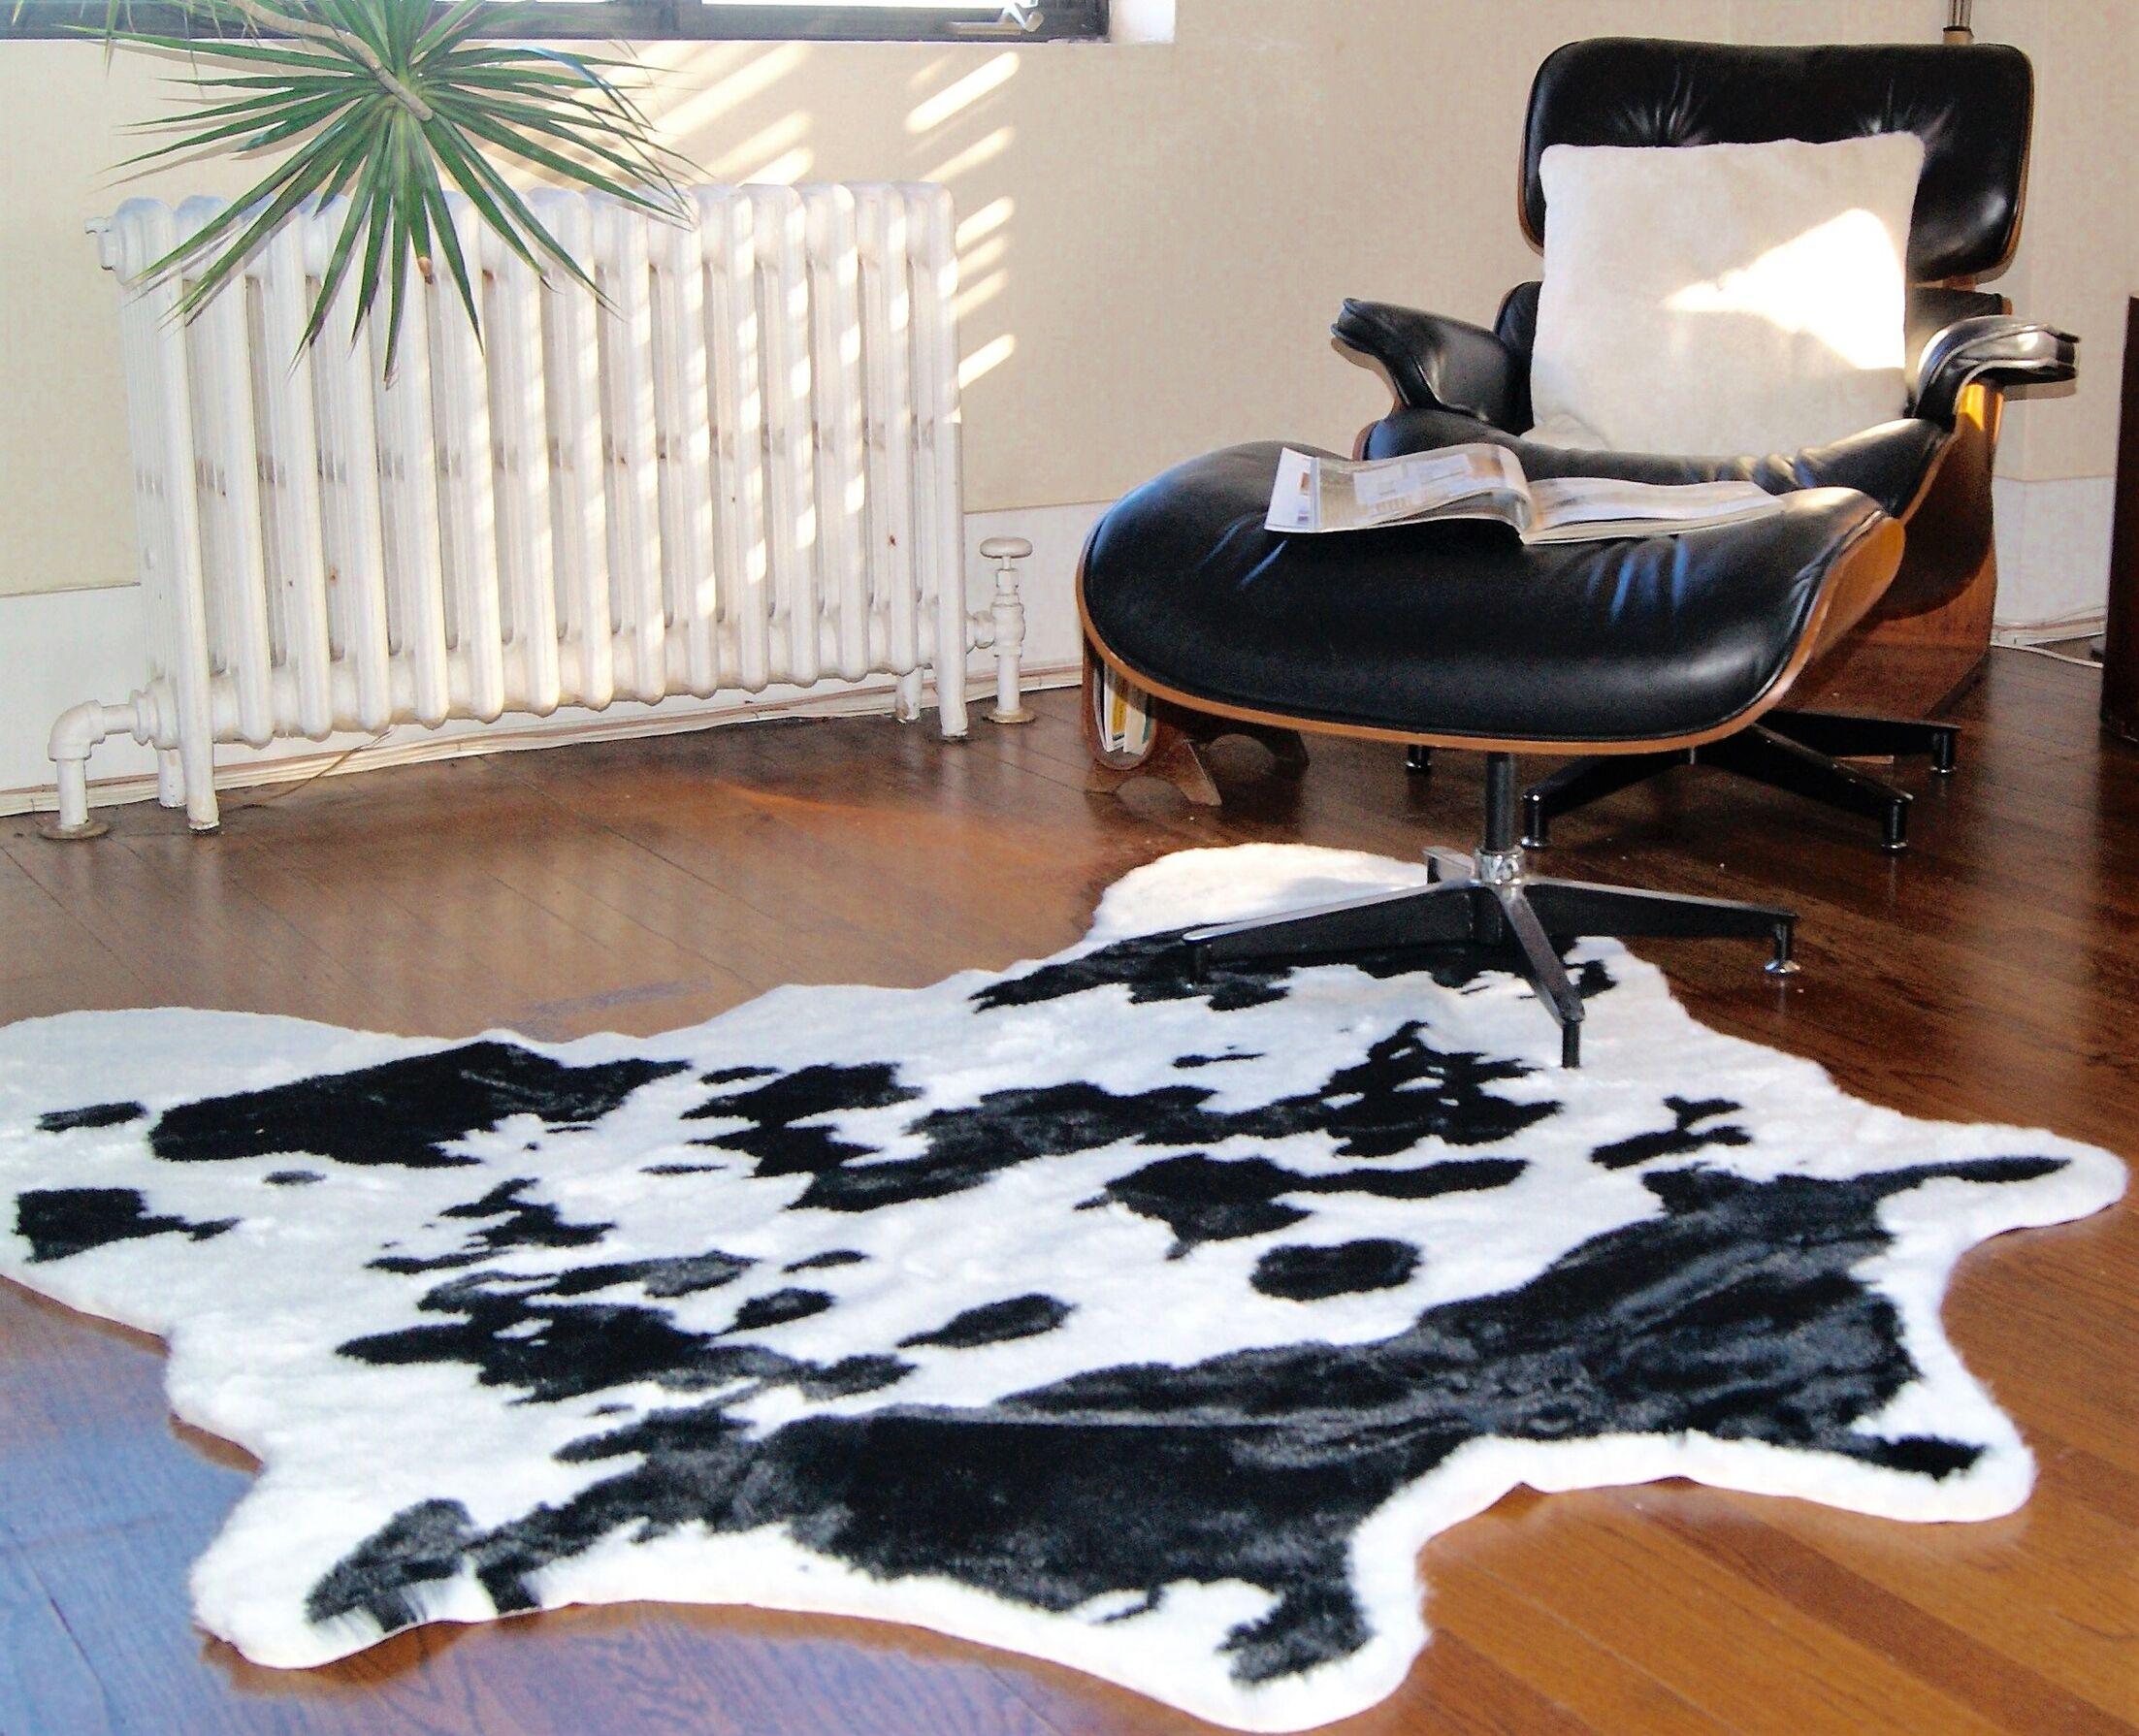 Sugarland Black/White Area Rug